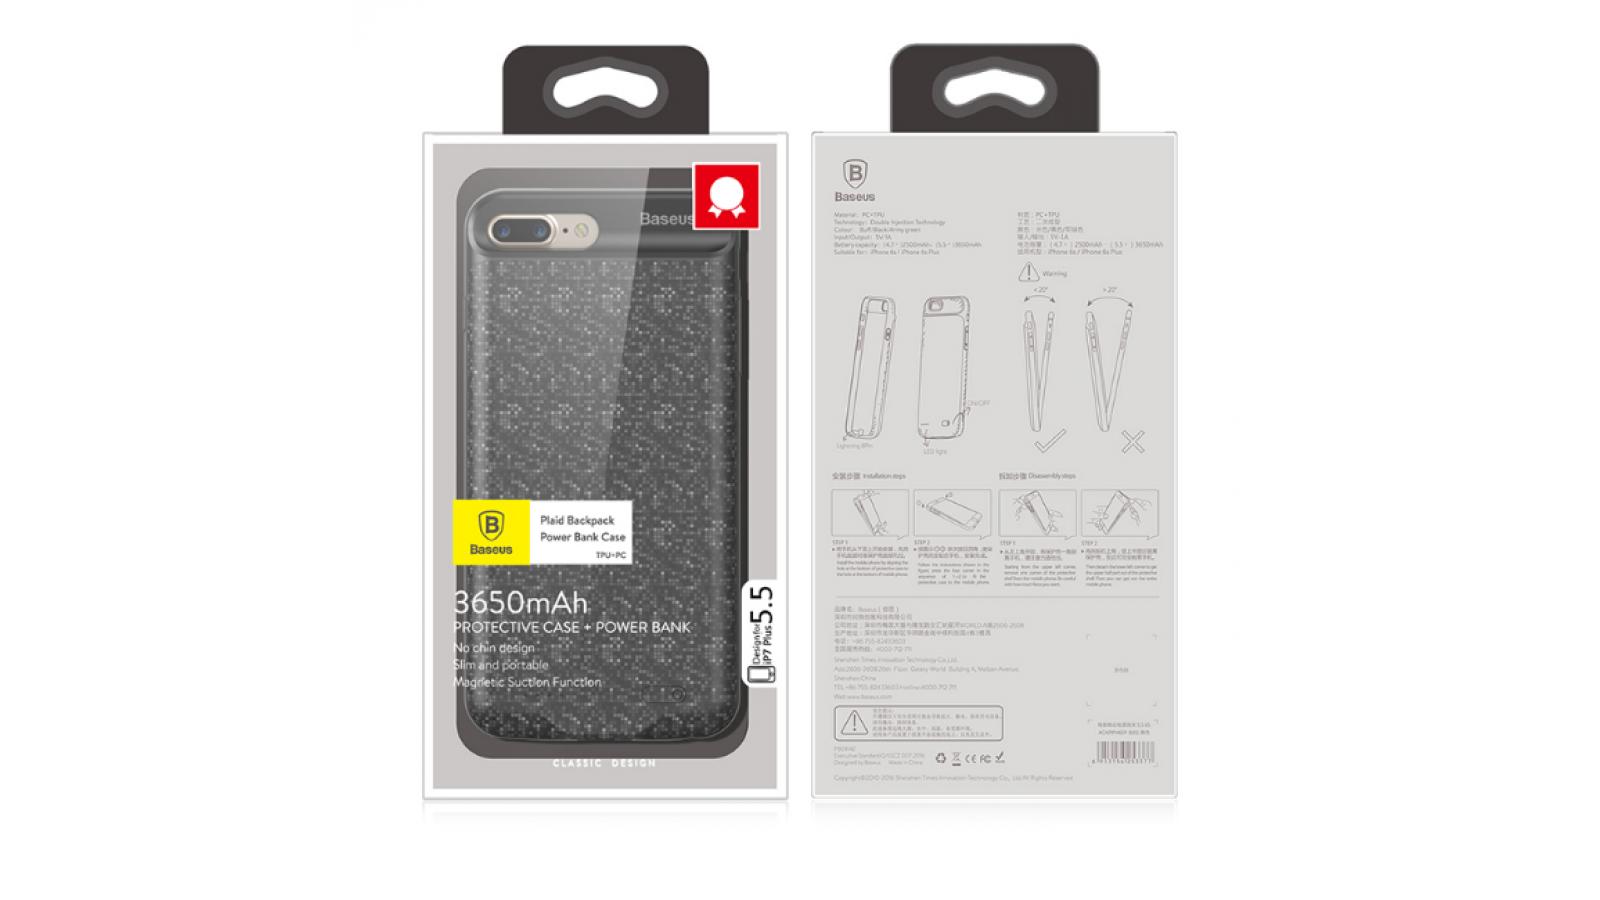 Funda carcasa protectora con batería de respaldo powerbank backpack para iPhone